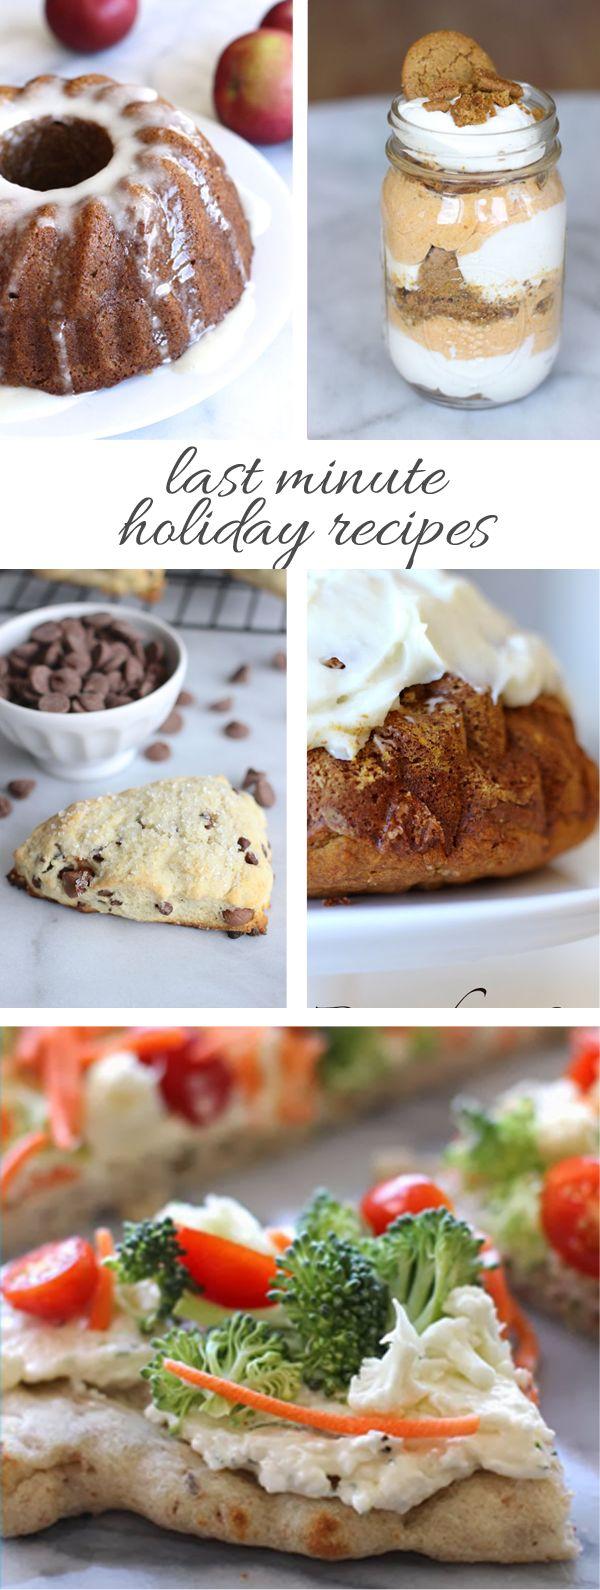 Last Minute Holiday Recipes via @mystylevita #holidays #entertaining #desserts